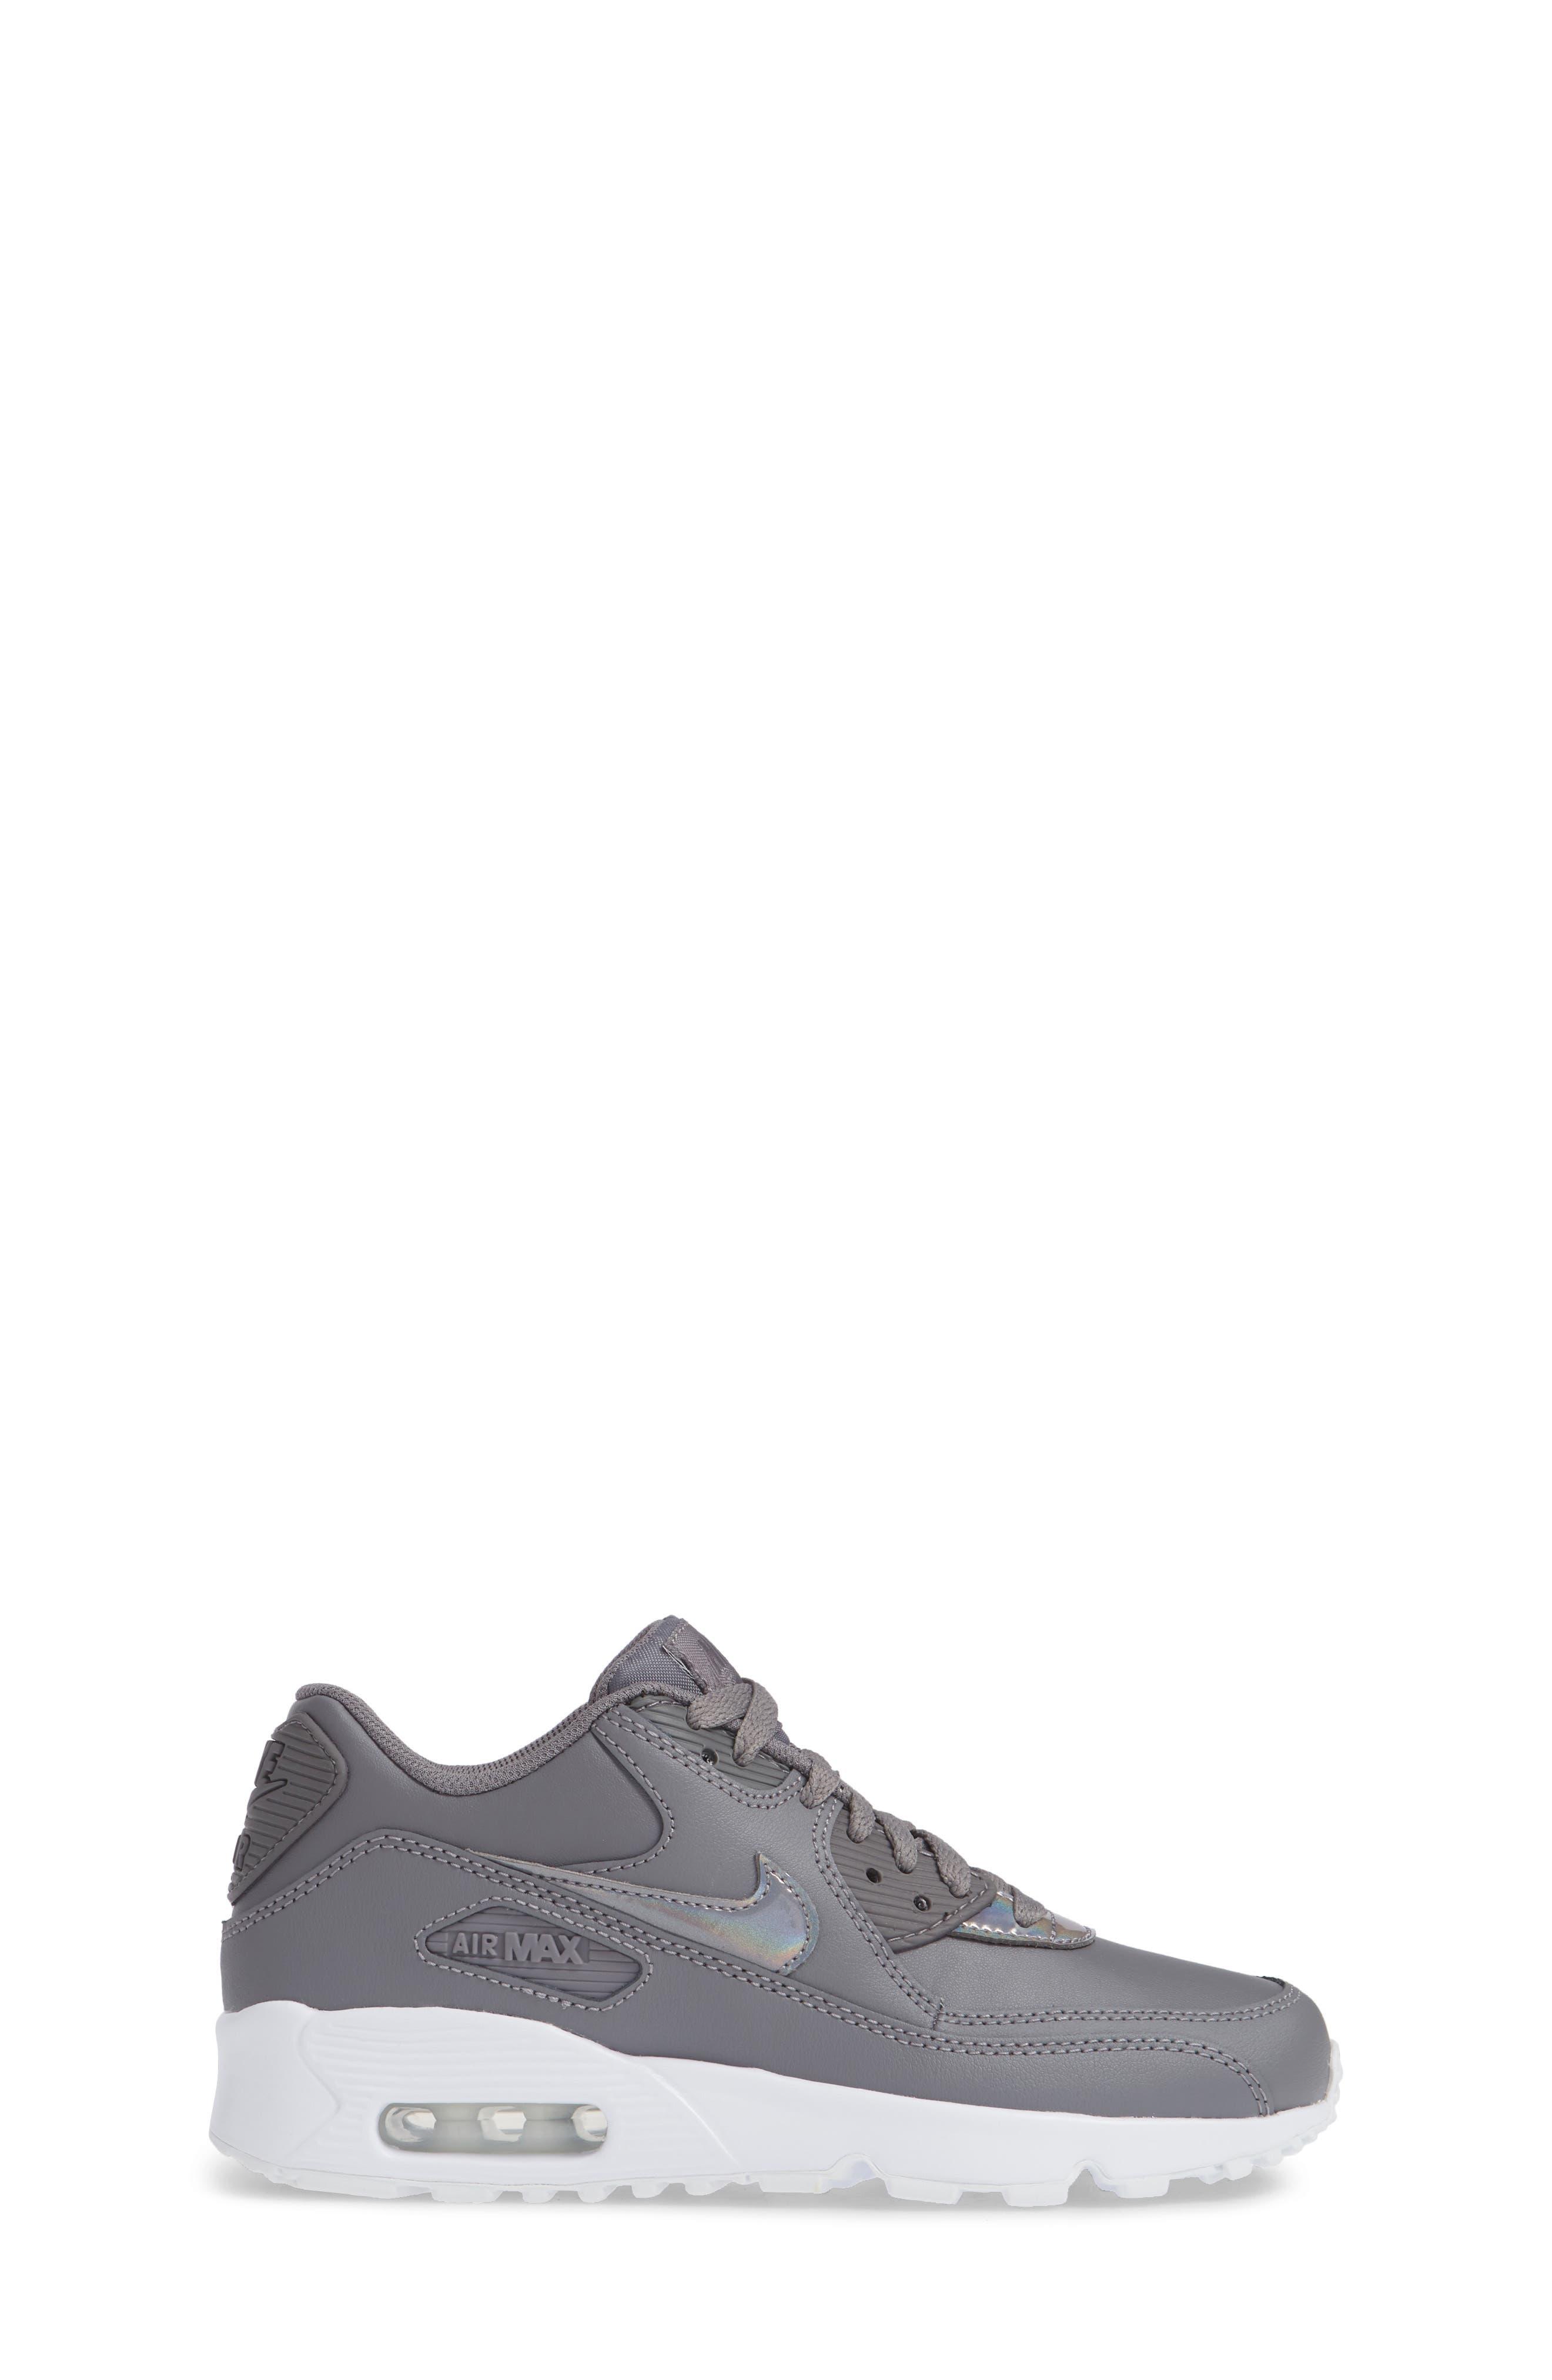 'Air Max 90' Sneaker,                             Alternate thumbnail 3, color,                             GUNSMOKE/ WHITE